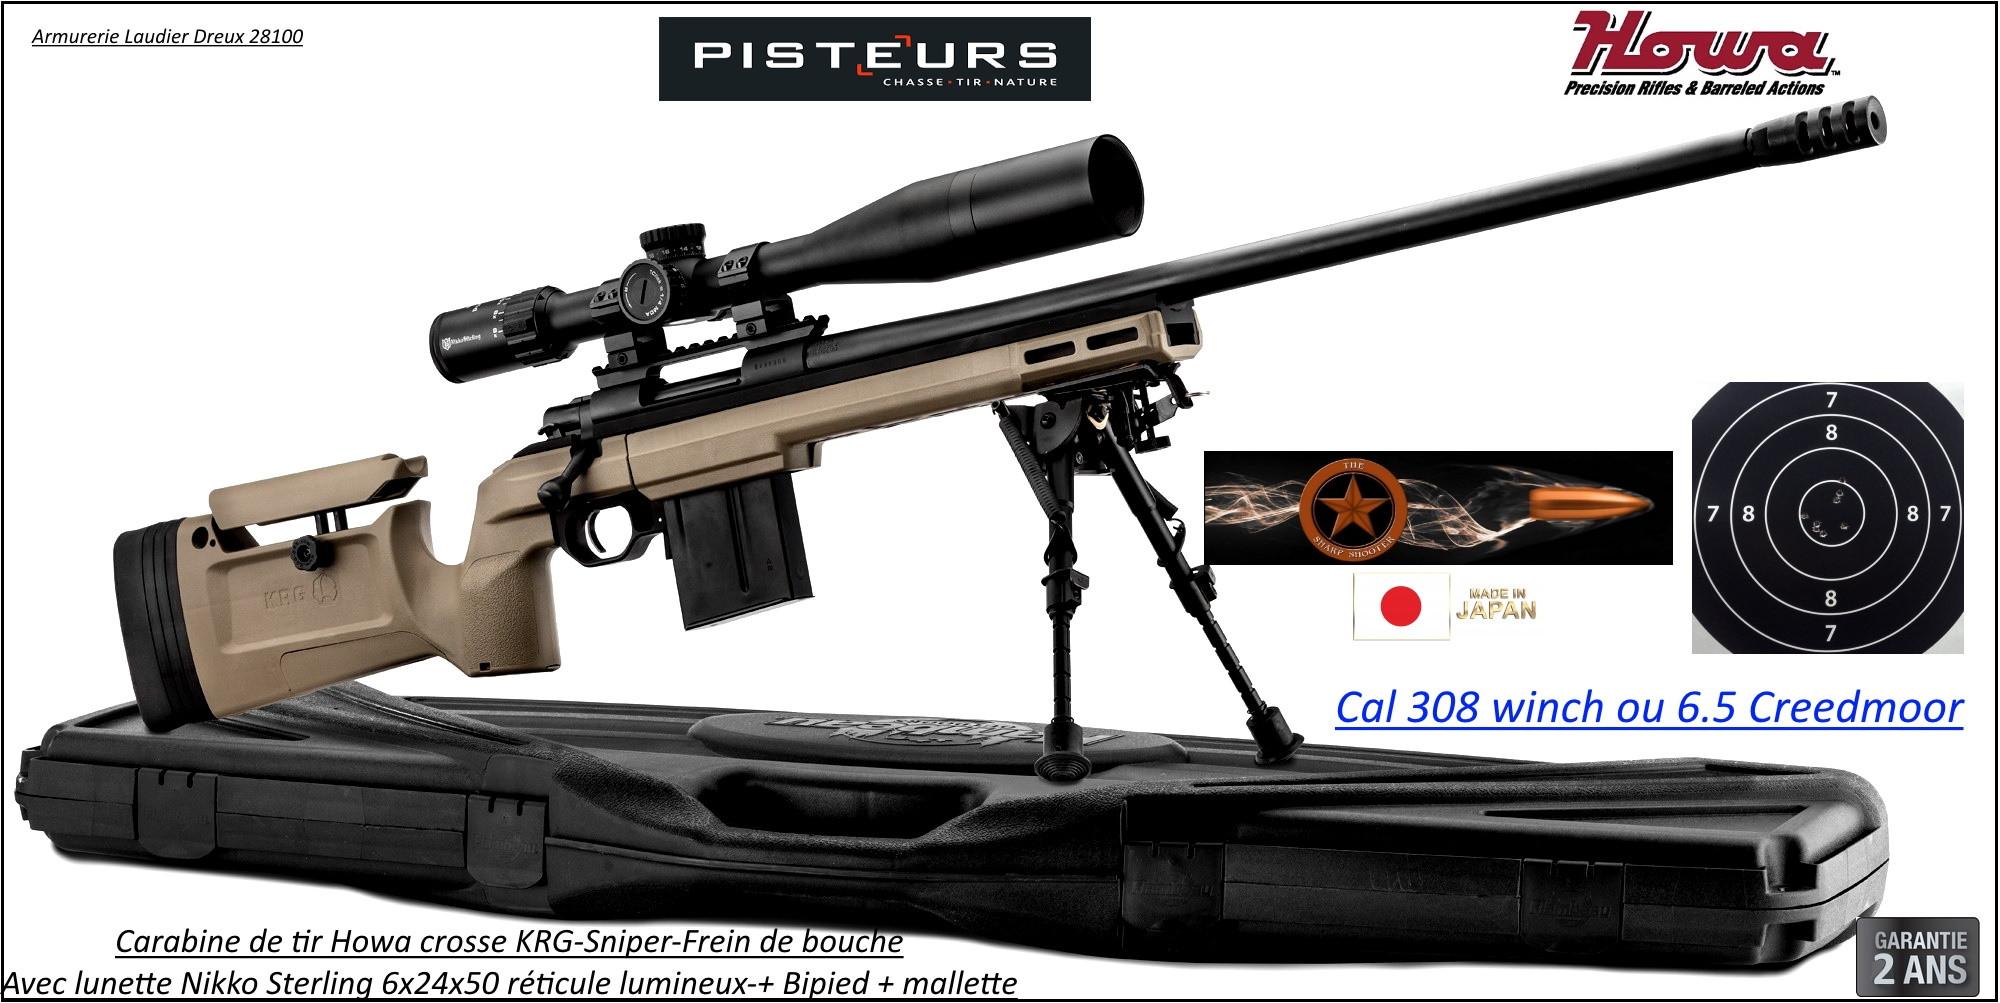 Carabines Howa KRG SNIPER Calibre 308 winch ou 6.5 Creedmoor Répétition Crosse réglable  rails picatini +lunette Nikko Sterling 6-24x50+Frein bouche+bipied-Promotions-